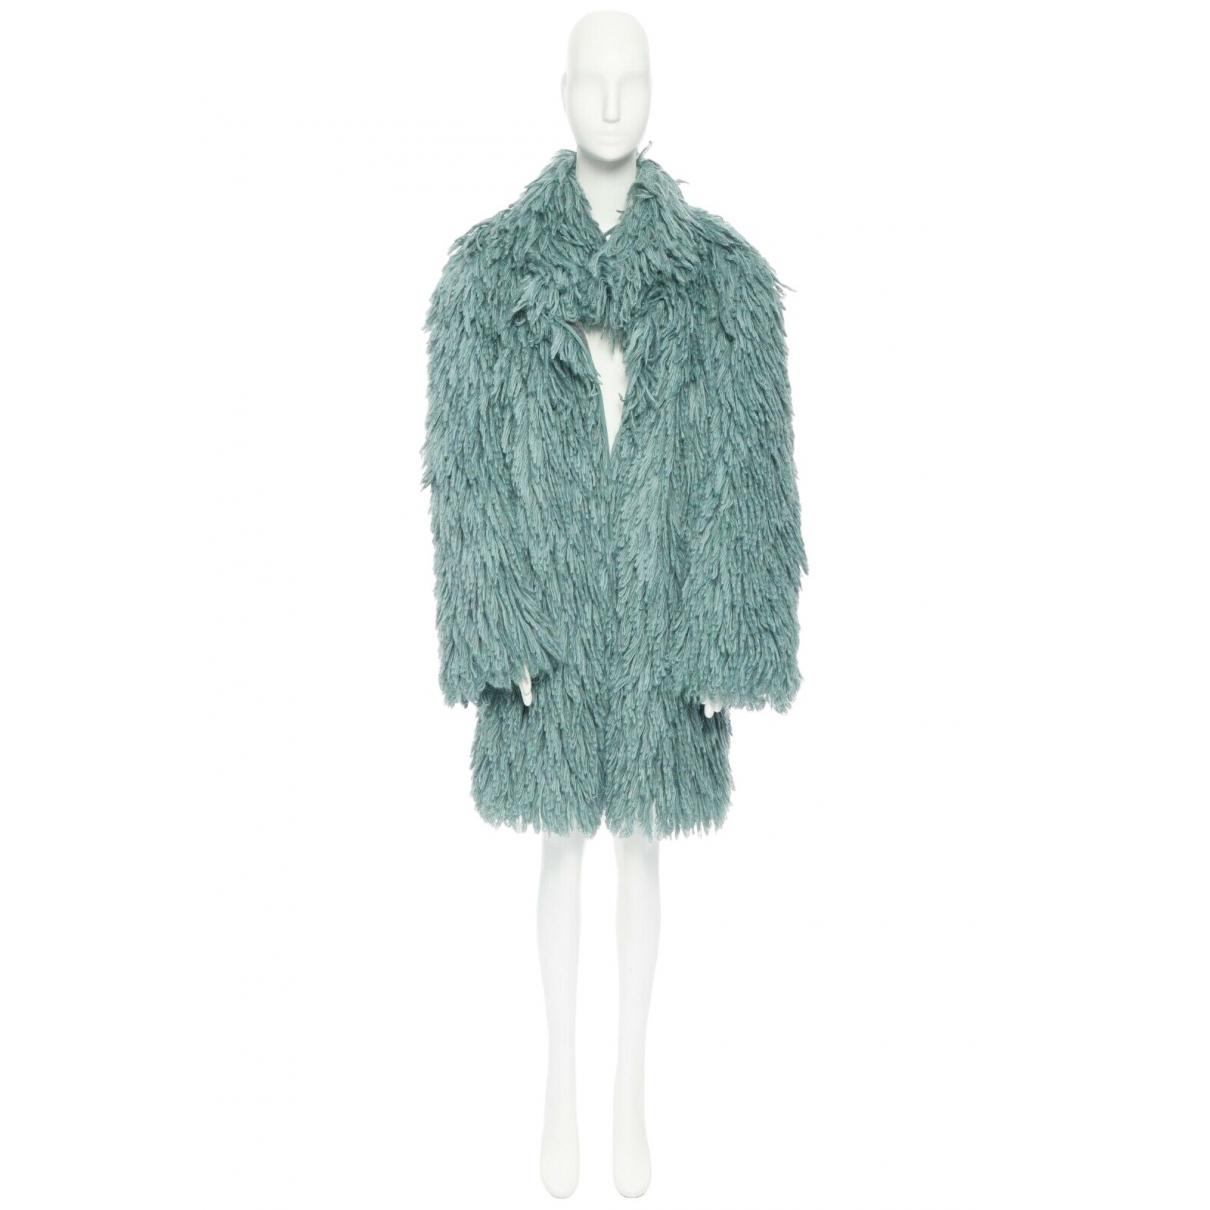 Bottega Veneta - Manteau   pour femme en laine - vert